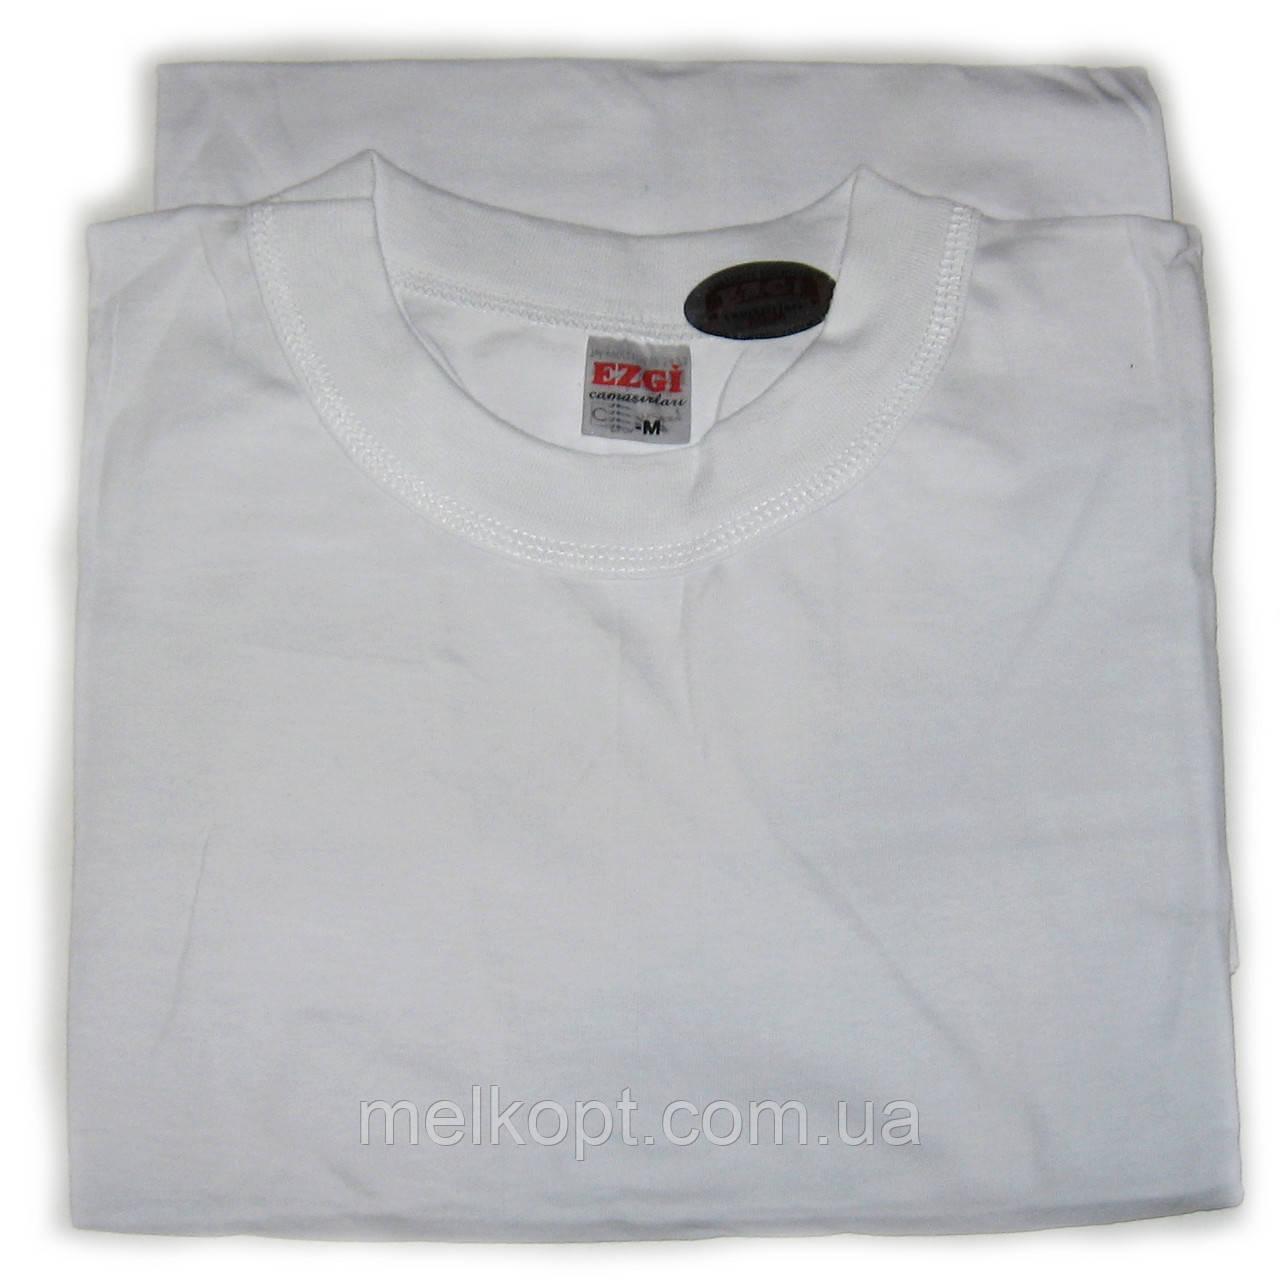 Мужские футболки Ezgi - 71,00 грн./шт. (75-й размер, белые)